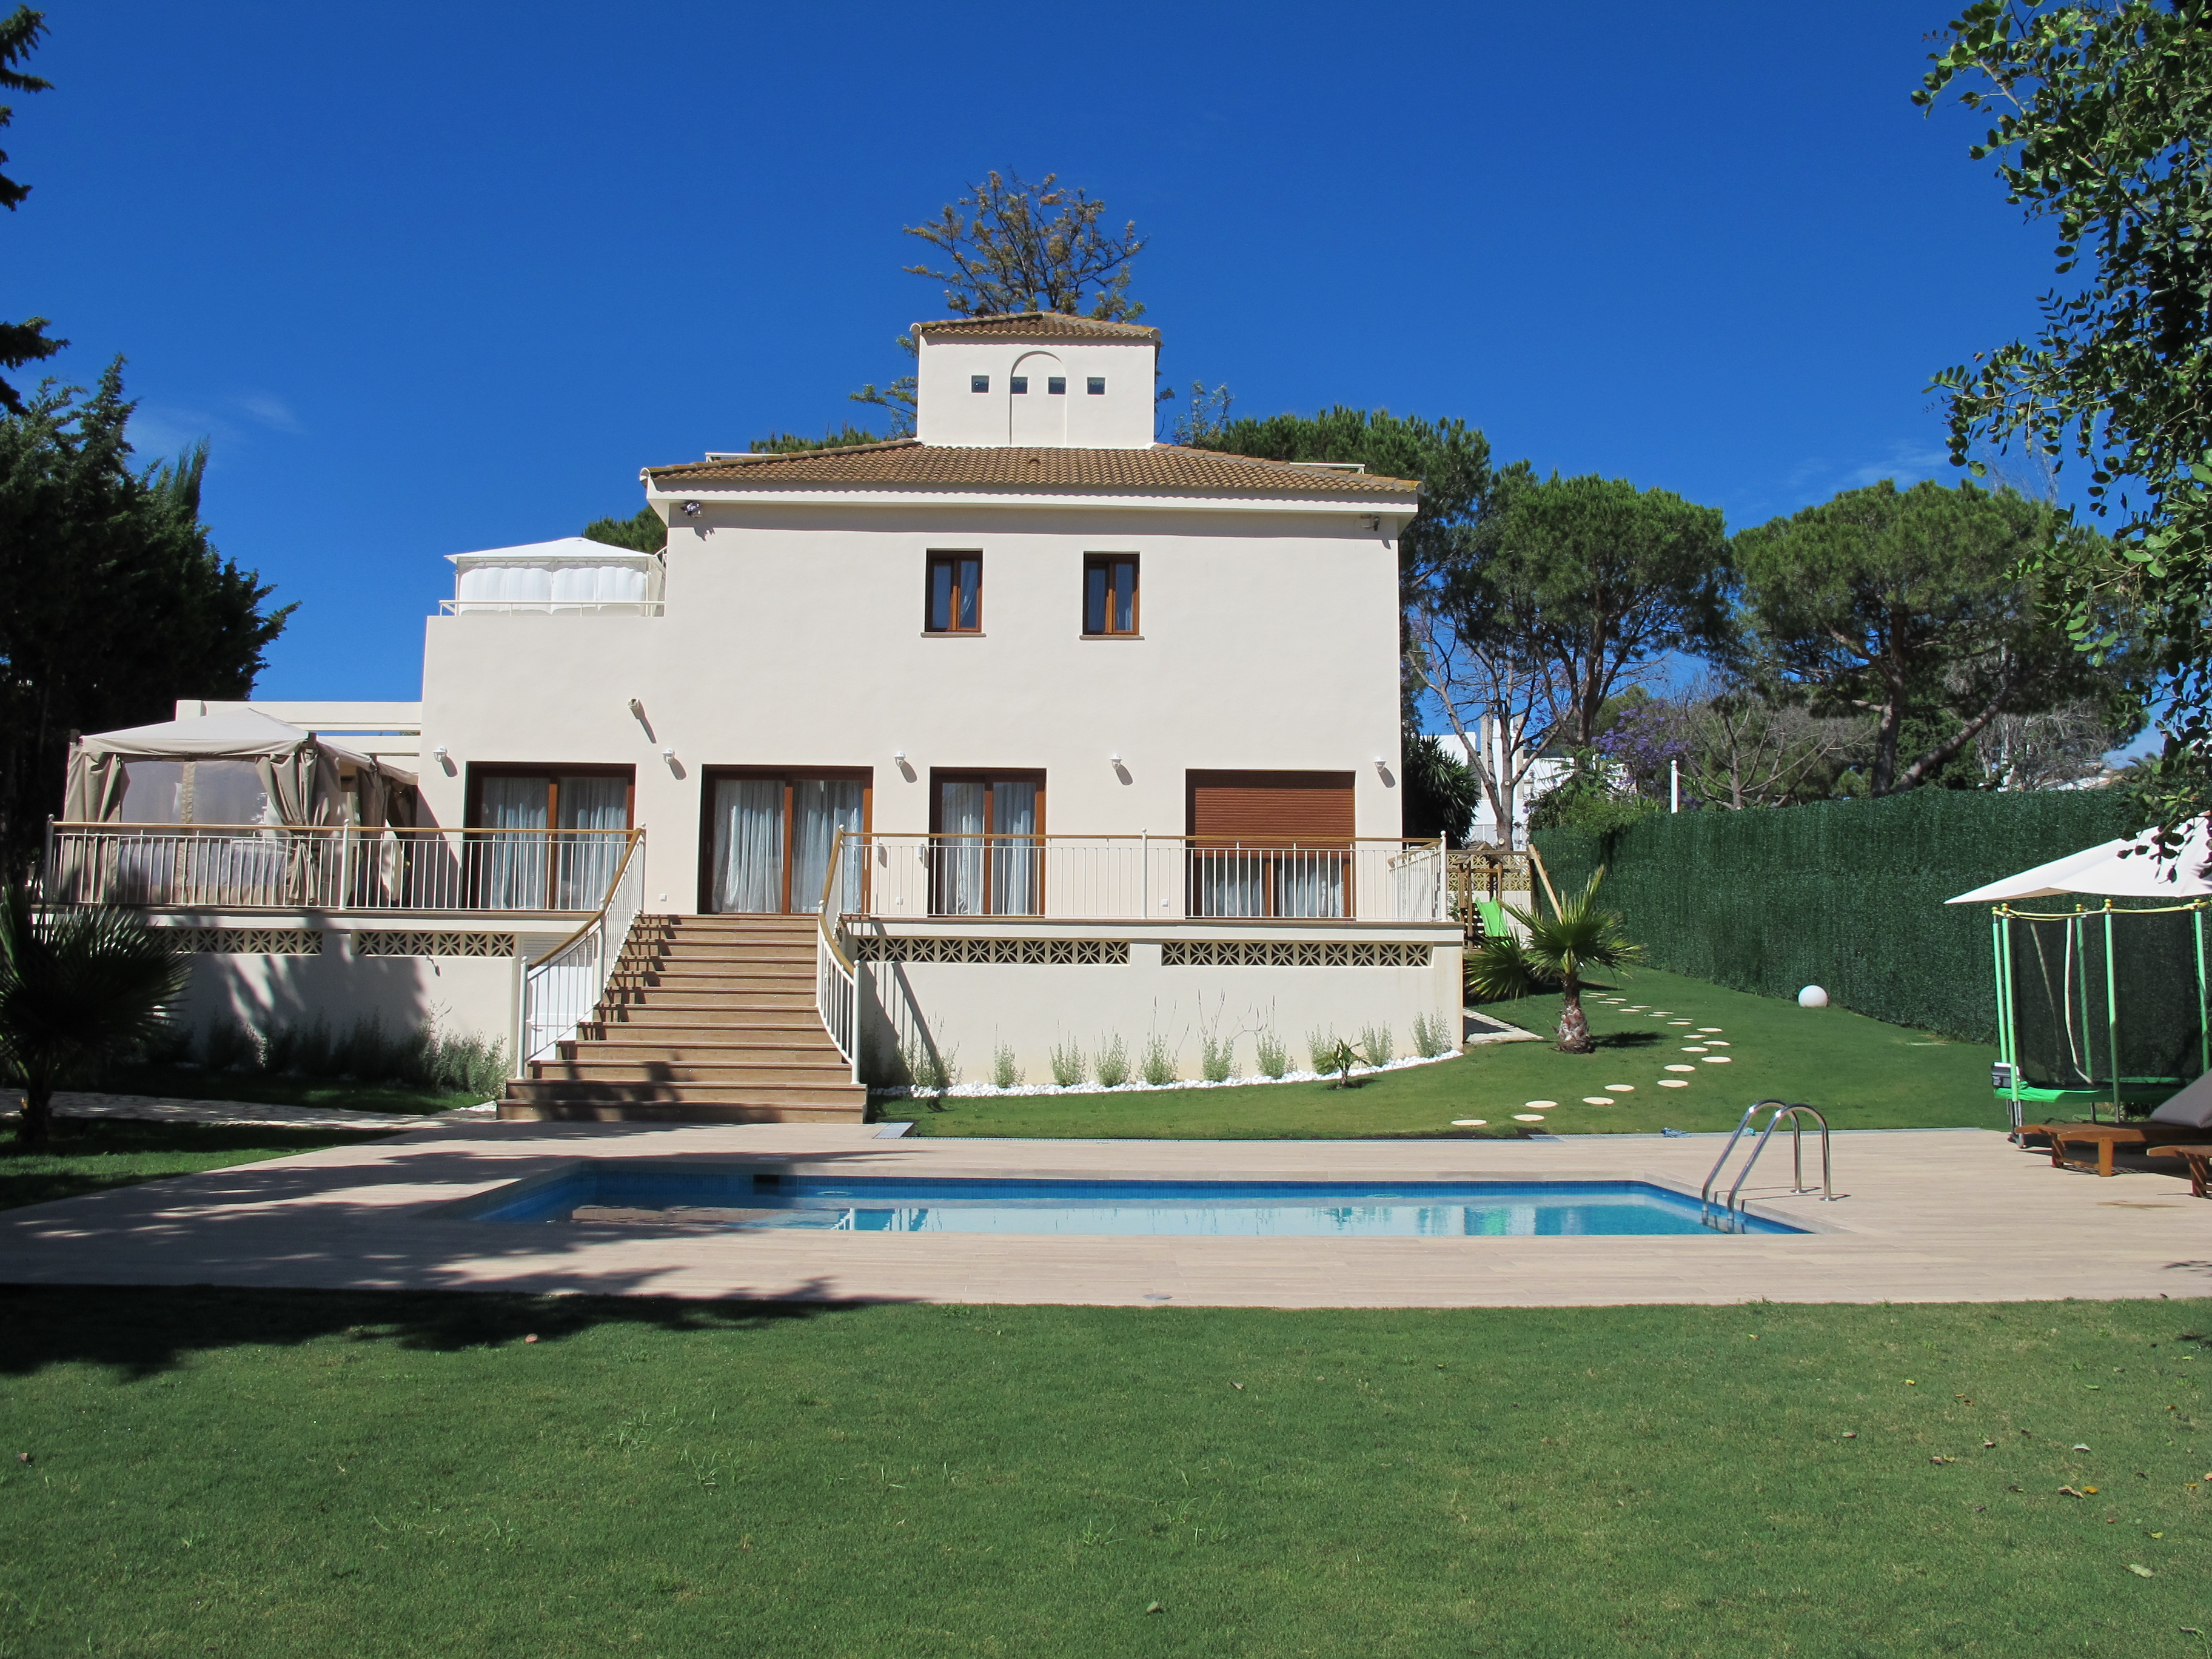 LUX0187: Villa in Marbella